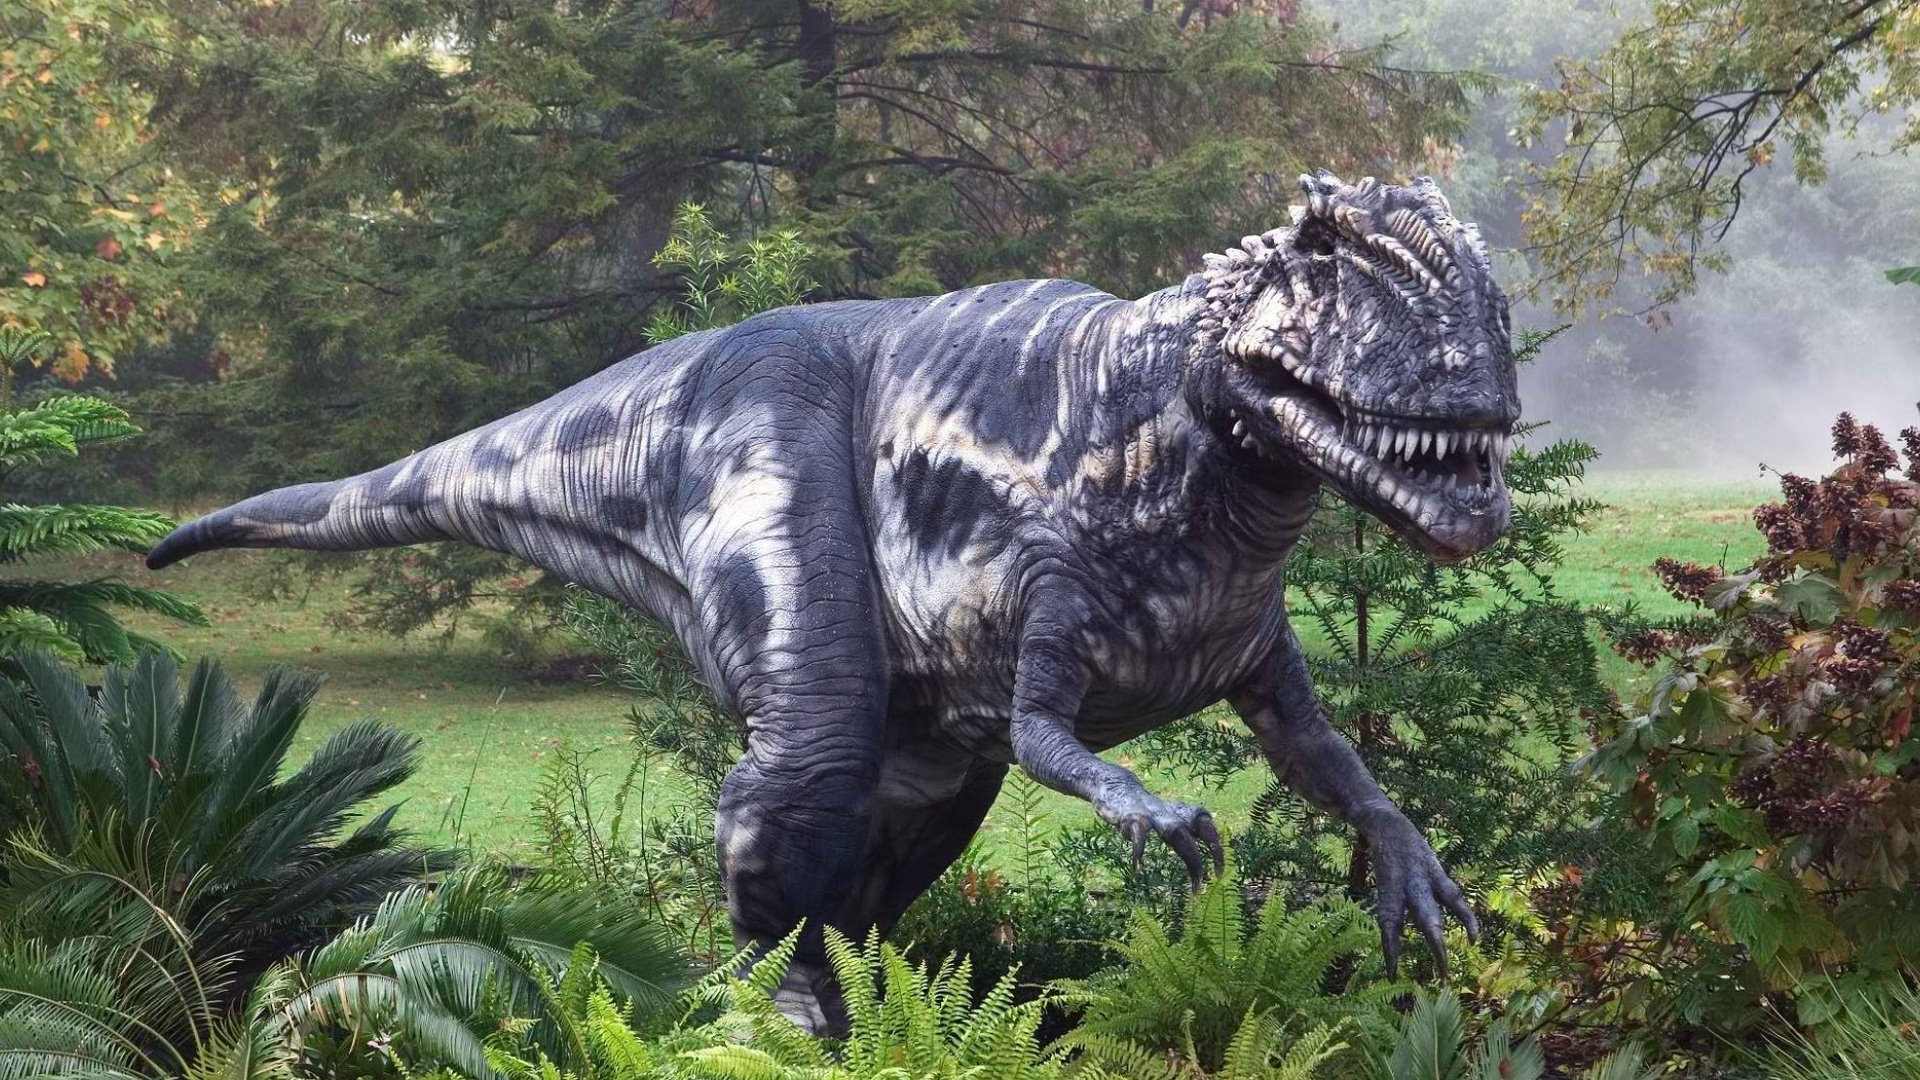 Yugioh Iphone Wallpaper Tyrannosaurus Rex Fond D 233 Cran Hd Arri 232 Re Plan